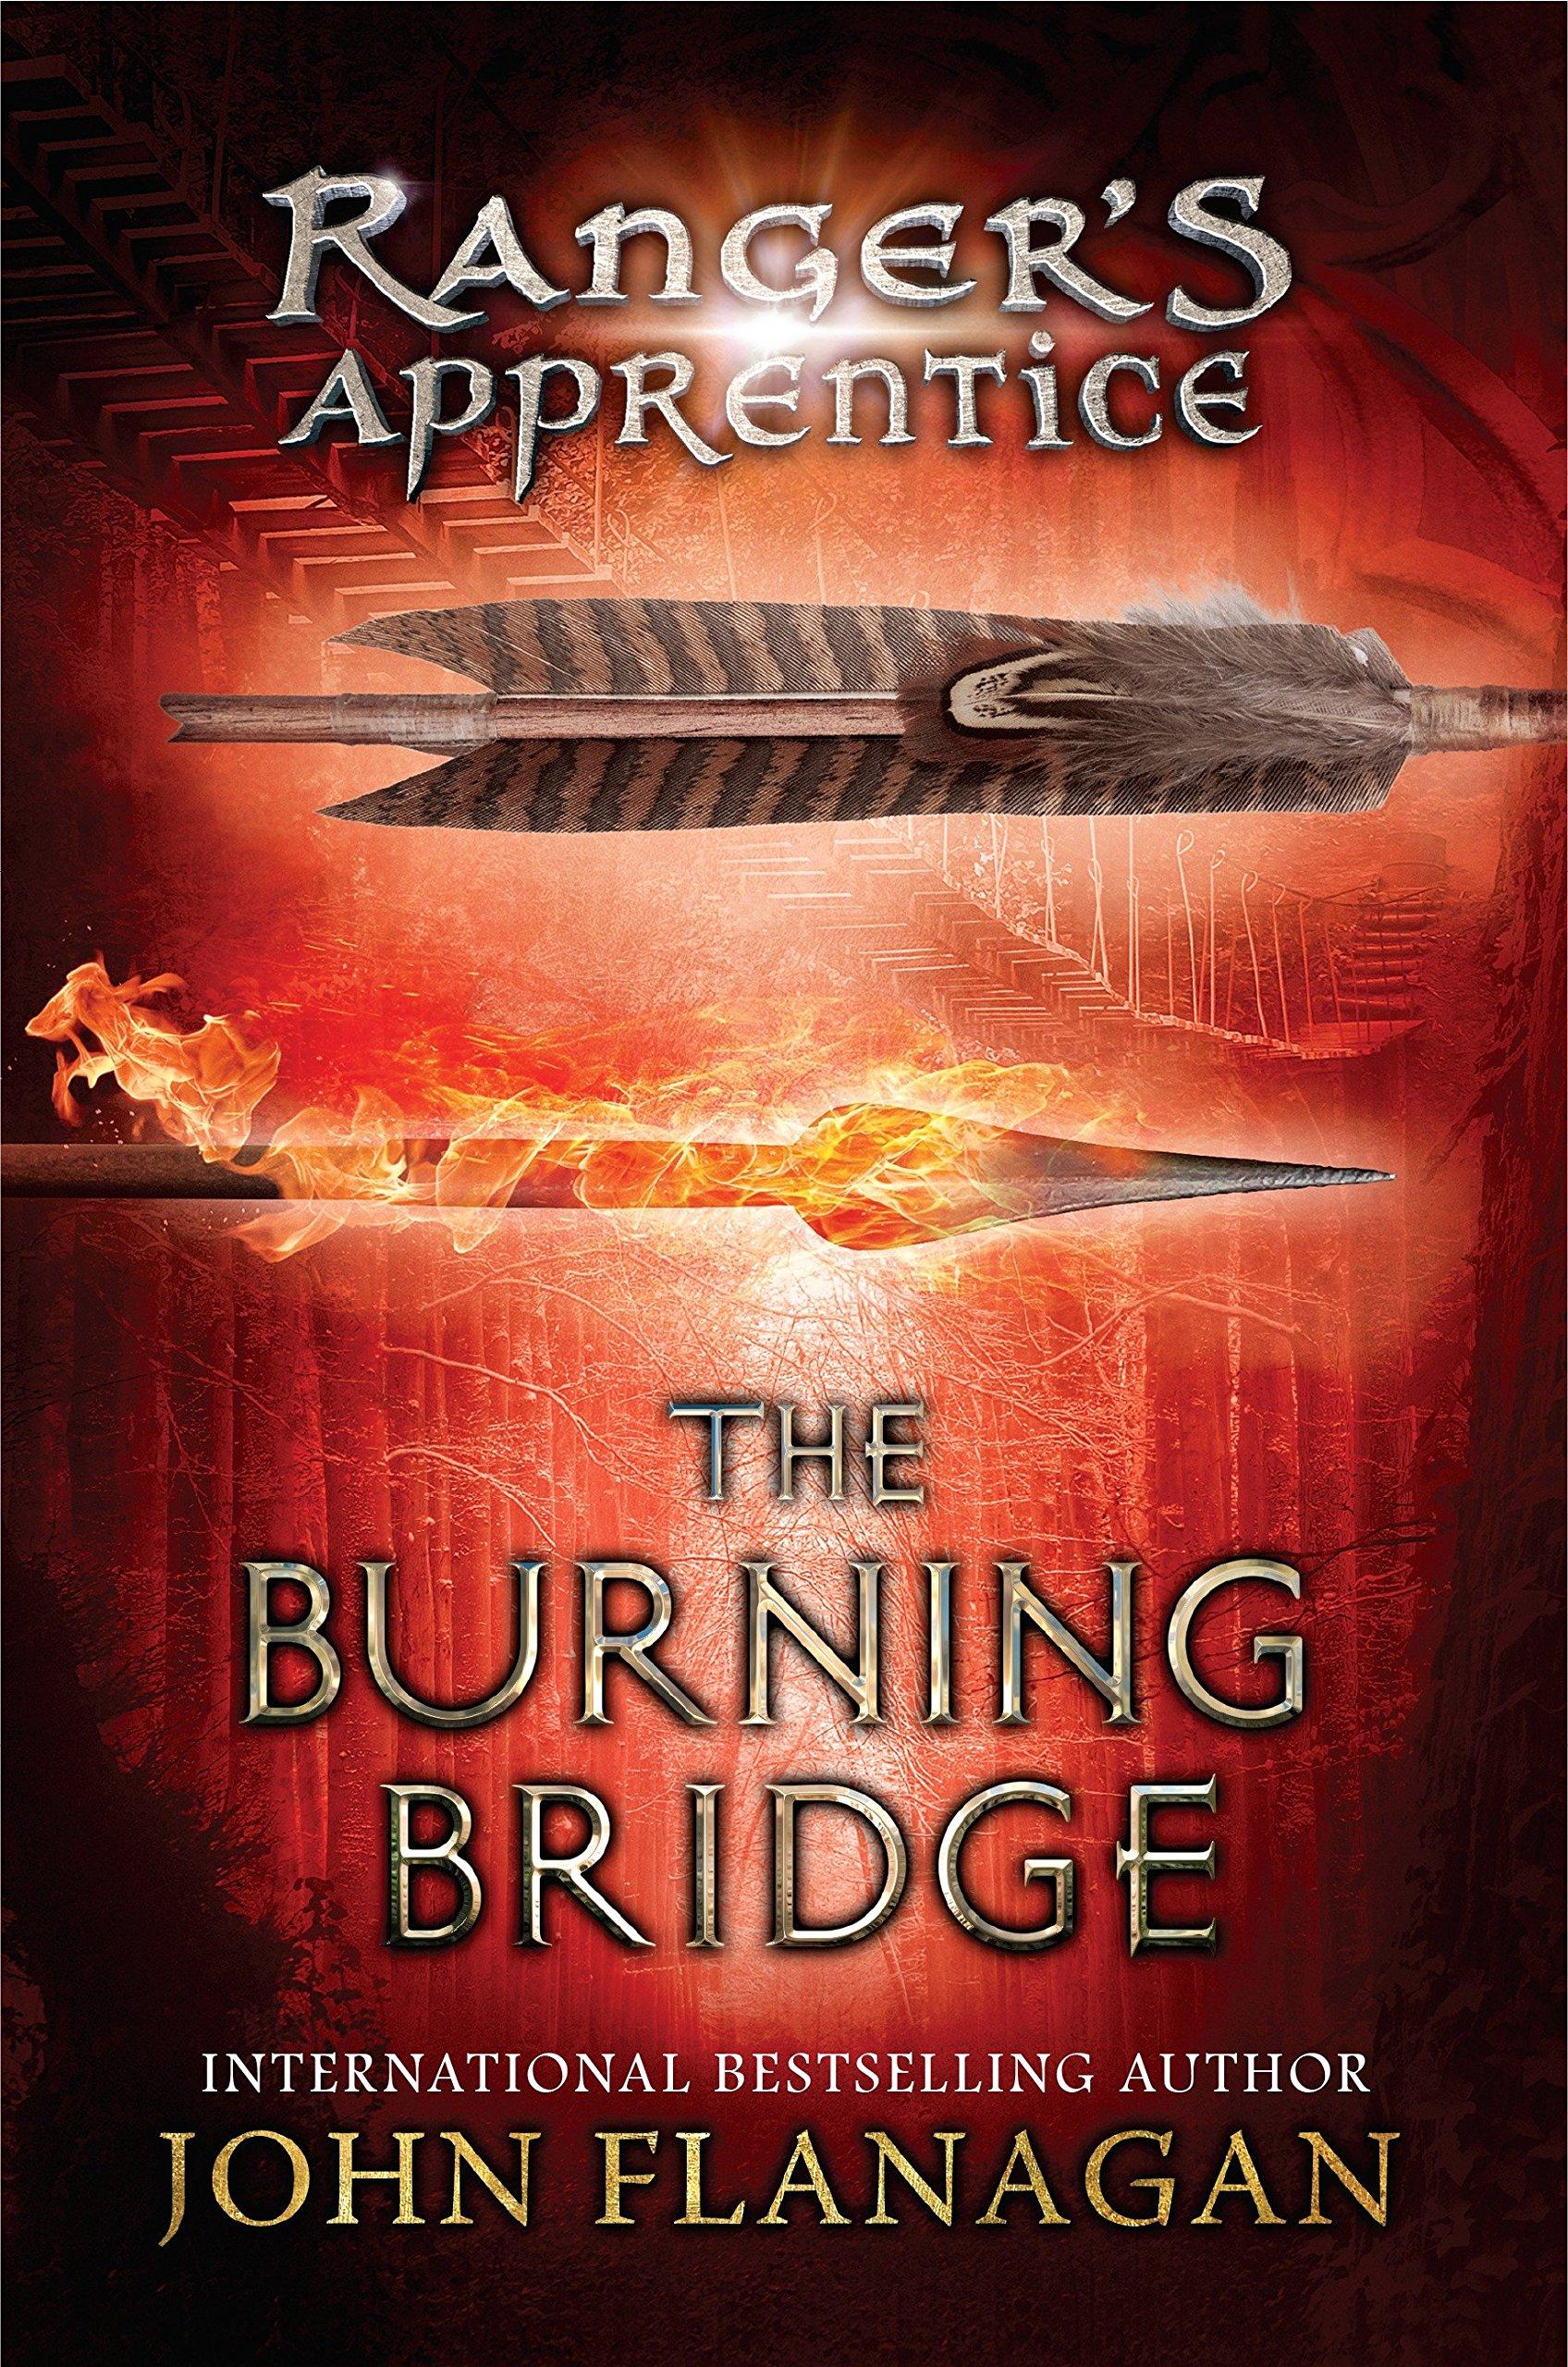 Ranger's Apprentice: The Burning Bridge - John Flanagan